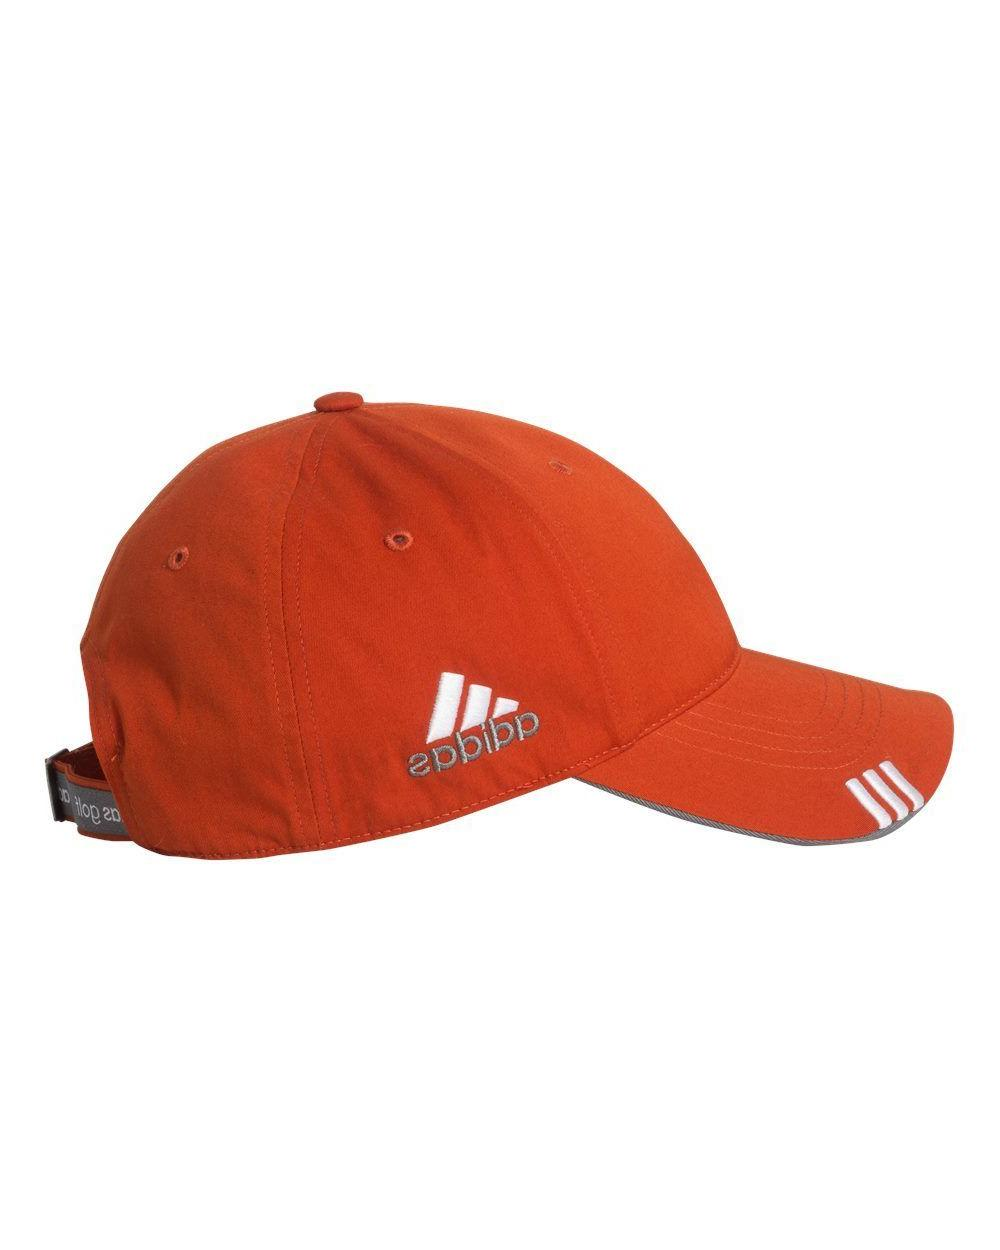 ADIDAS Men's Baseball Structure Hat SIZE